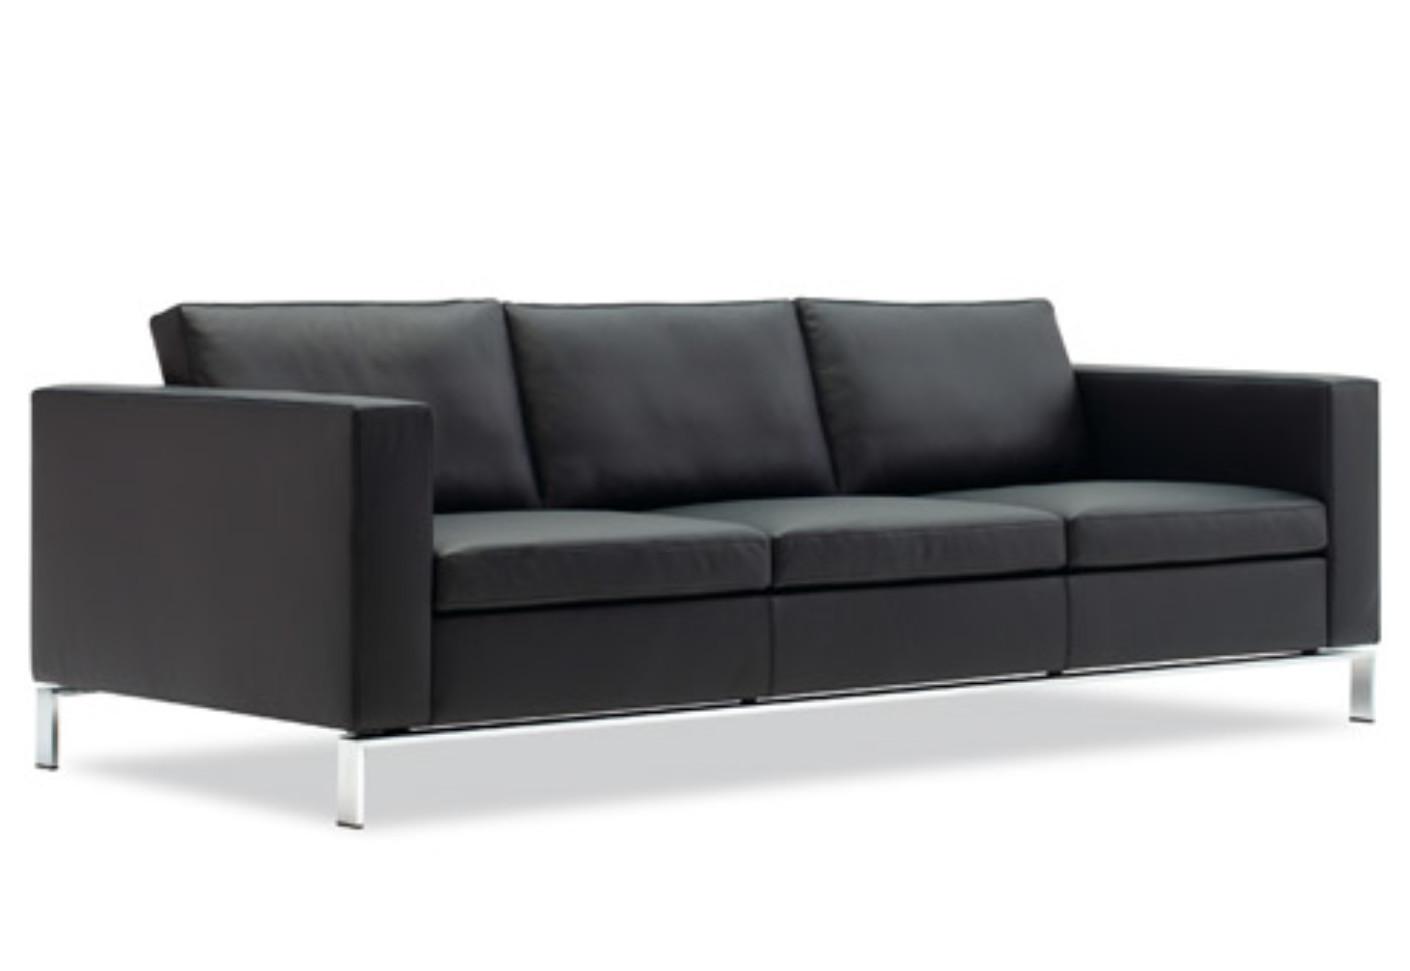 foster sofa walter knoll sofa. Black Bedroom Furniture Sets. Home Design Ideas